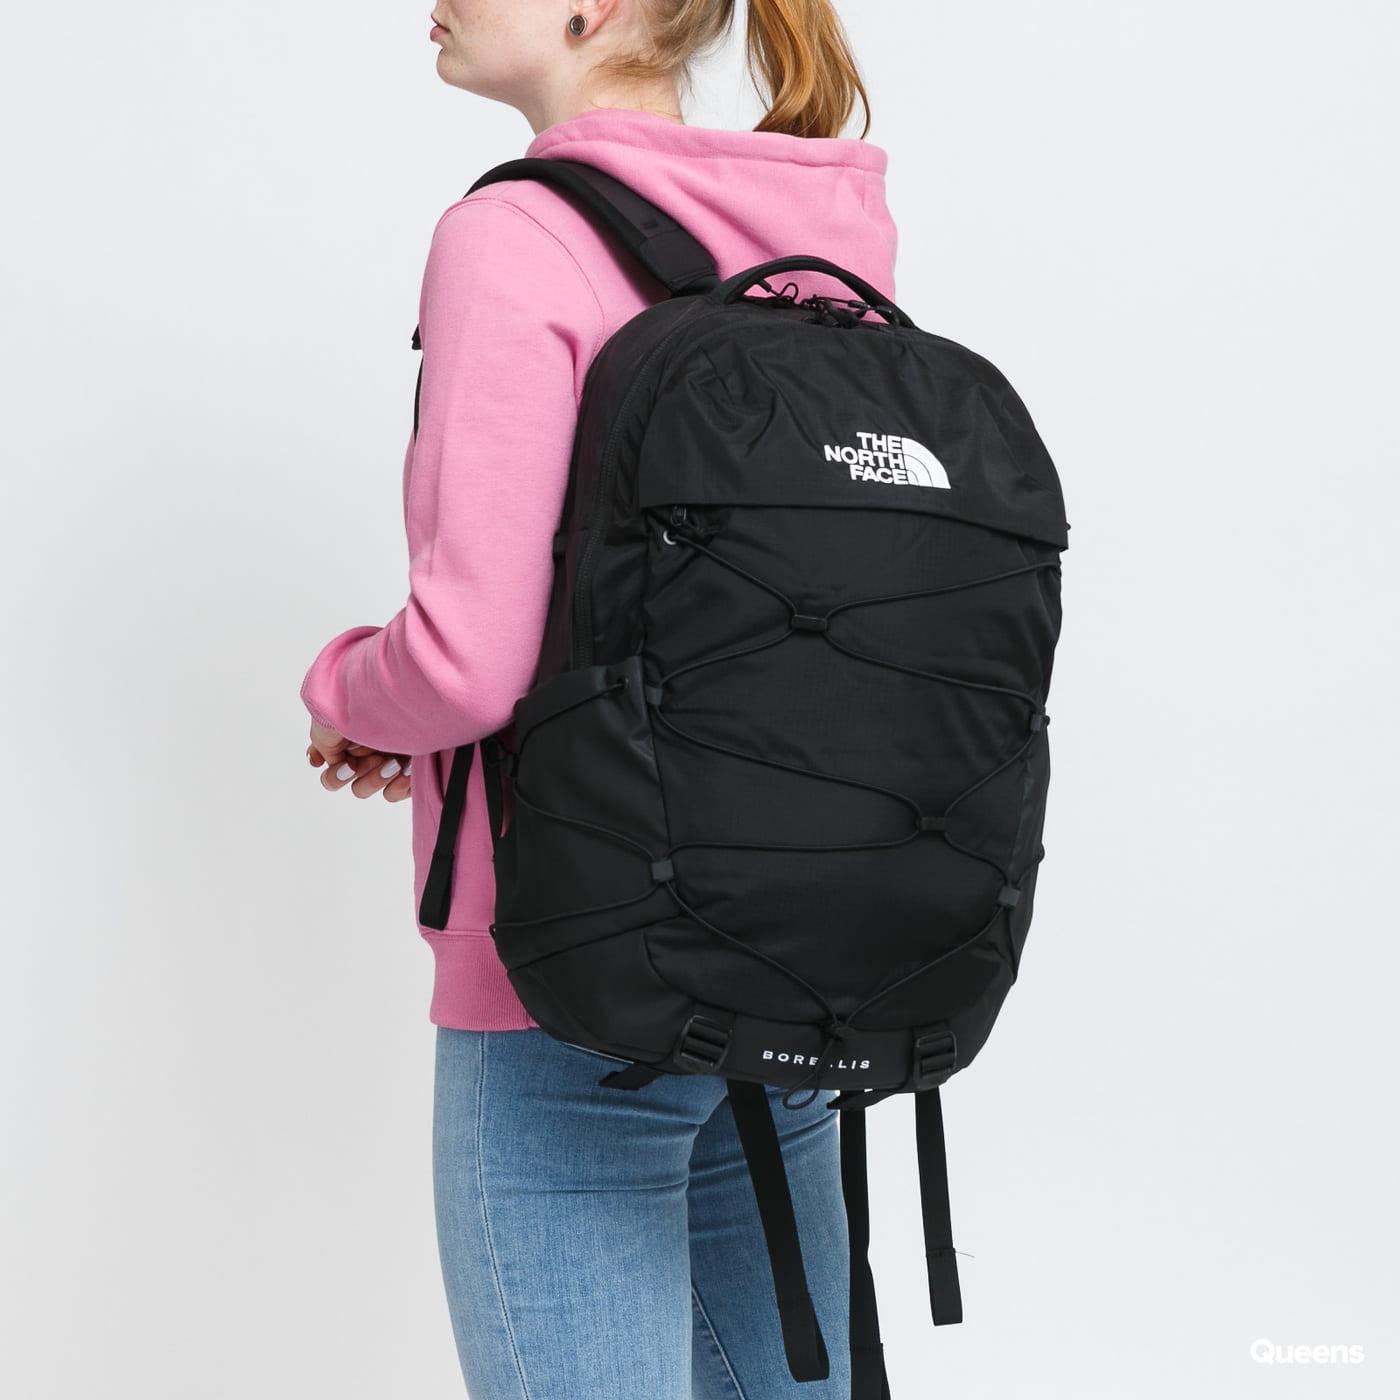 The North Face Borealis Backpack černý